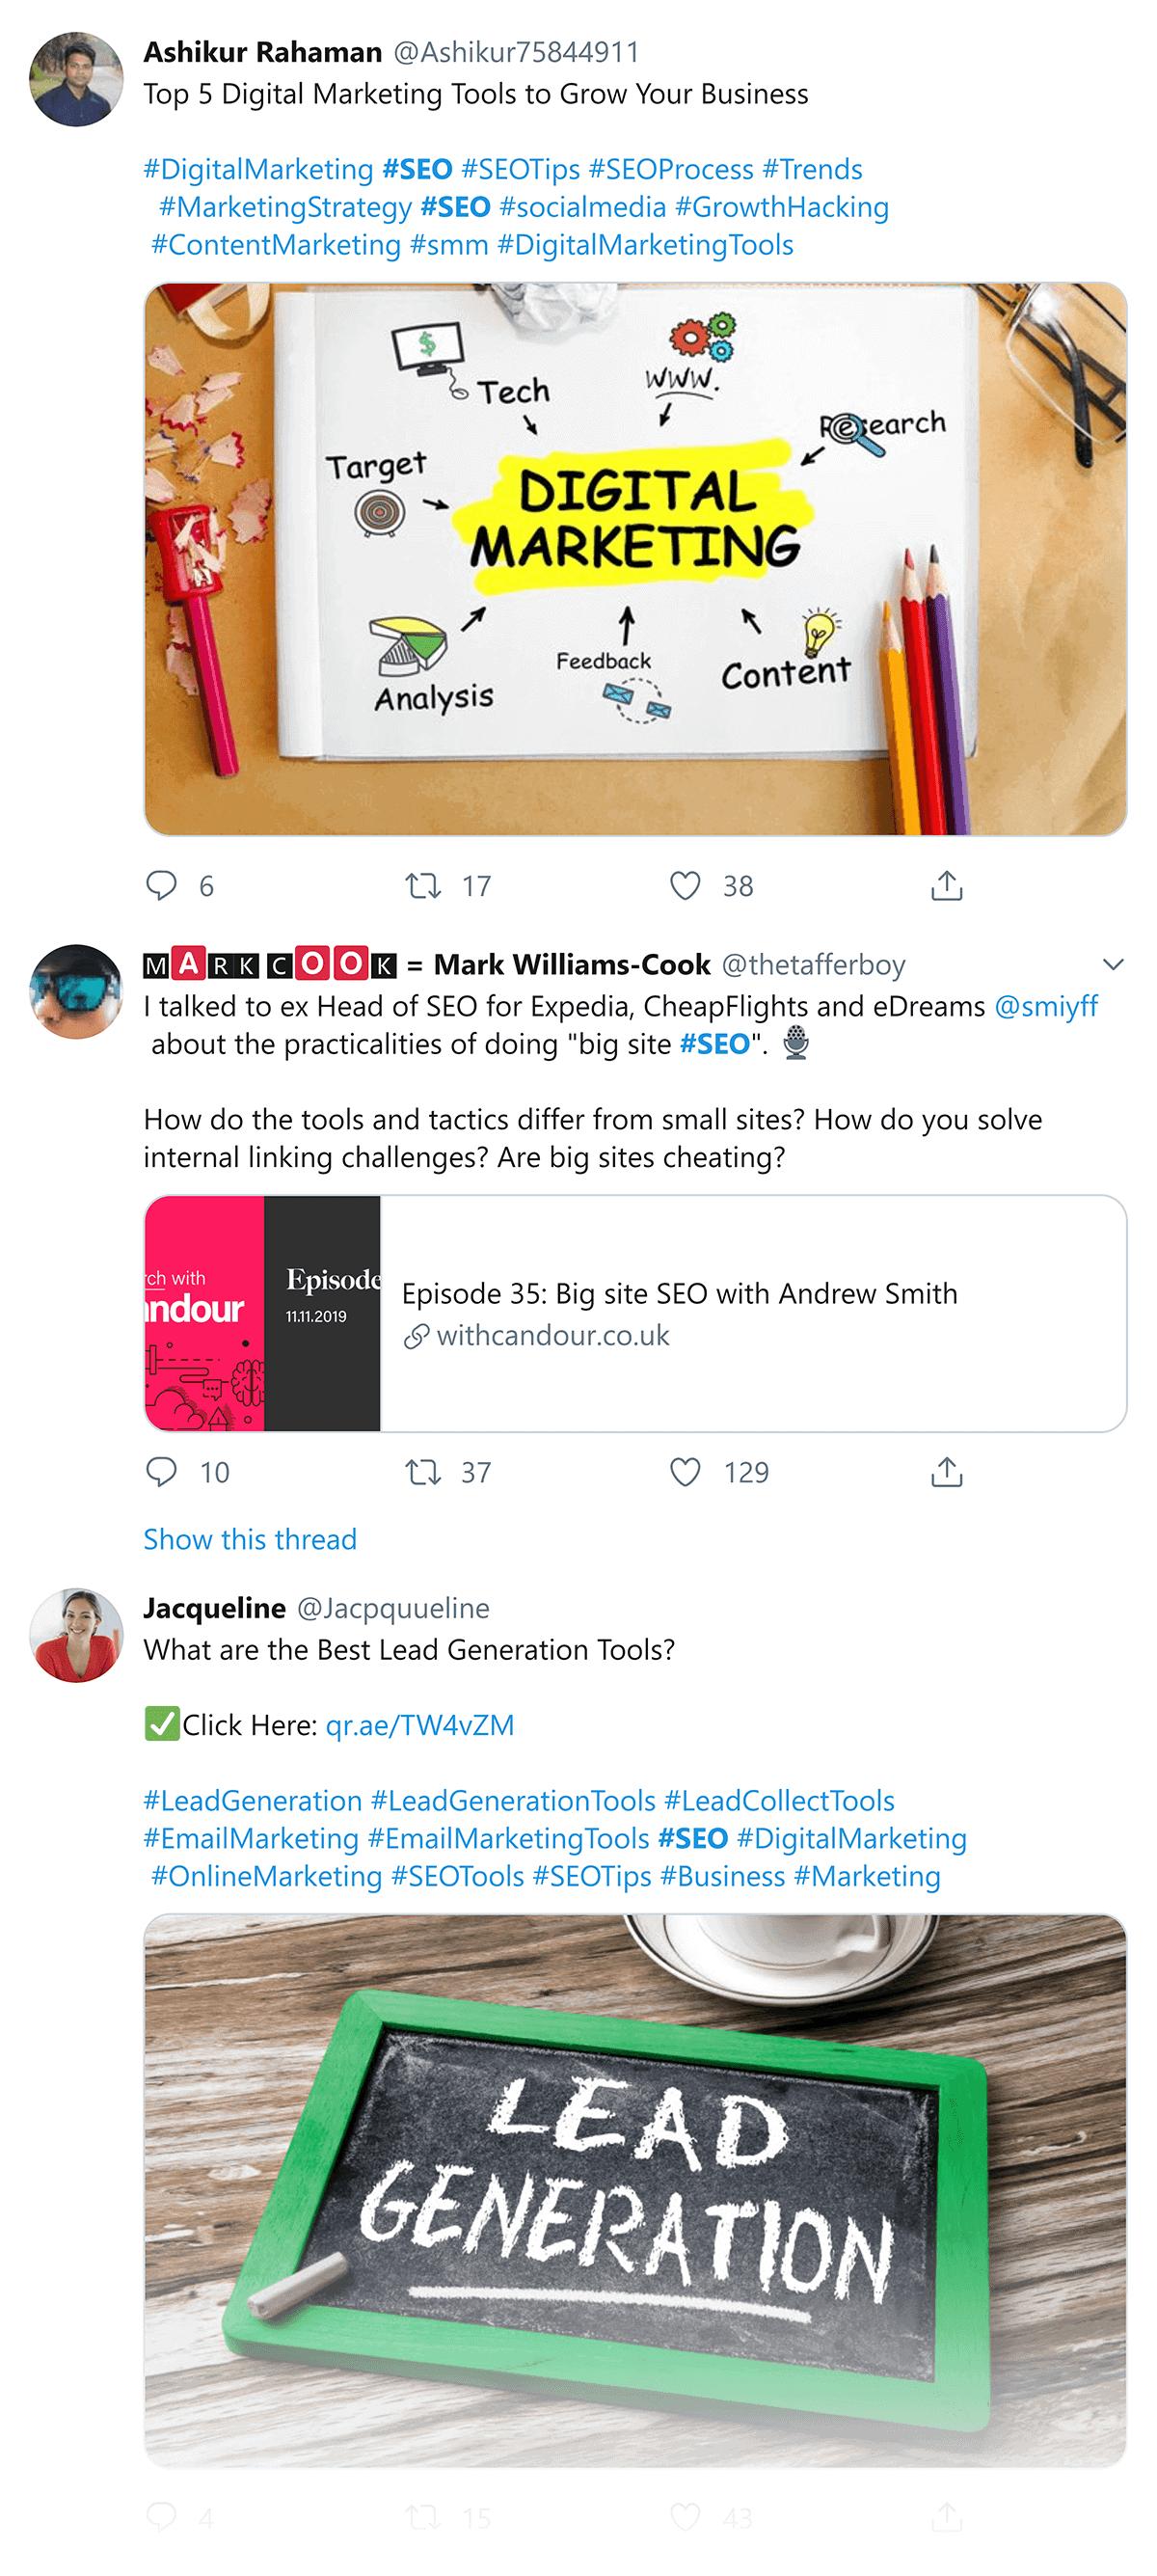 Trending SEO content on Twitter